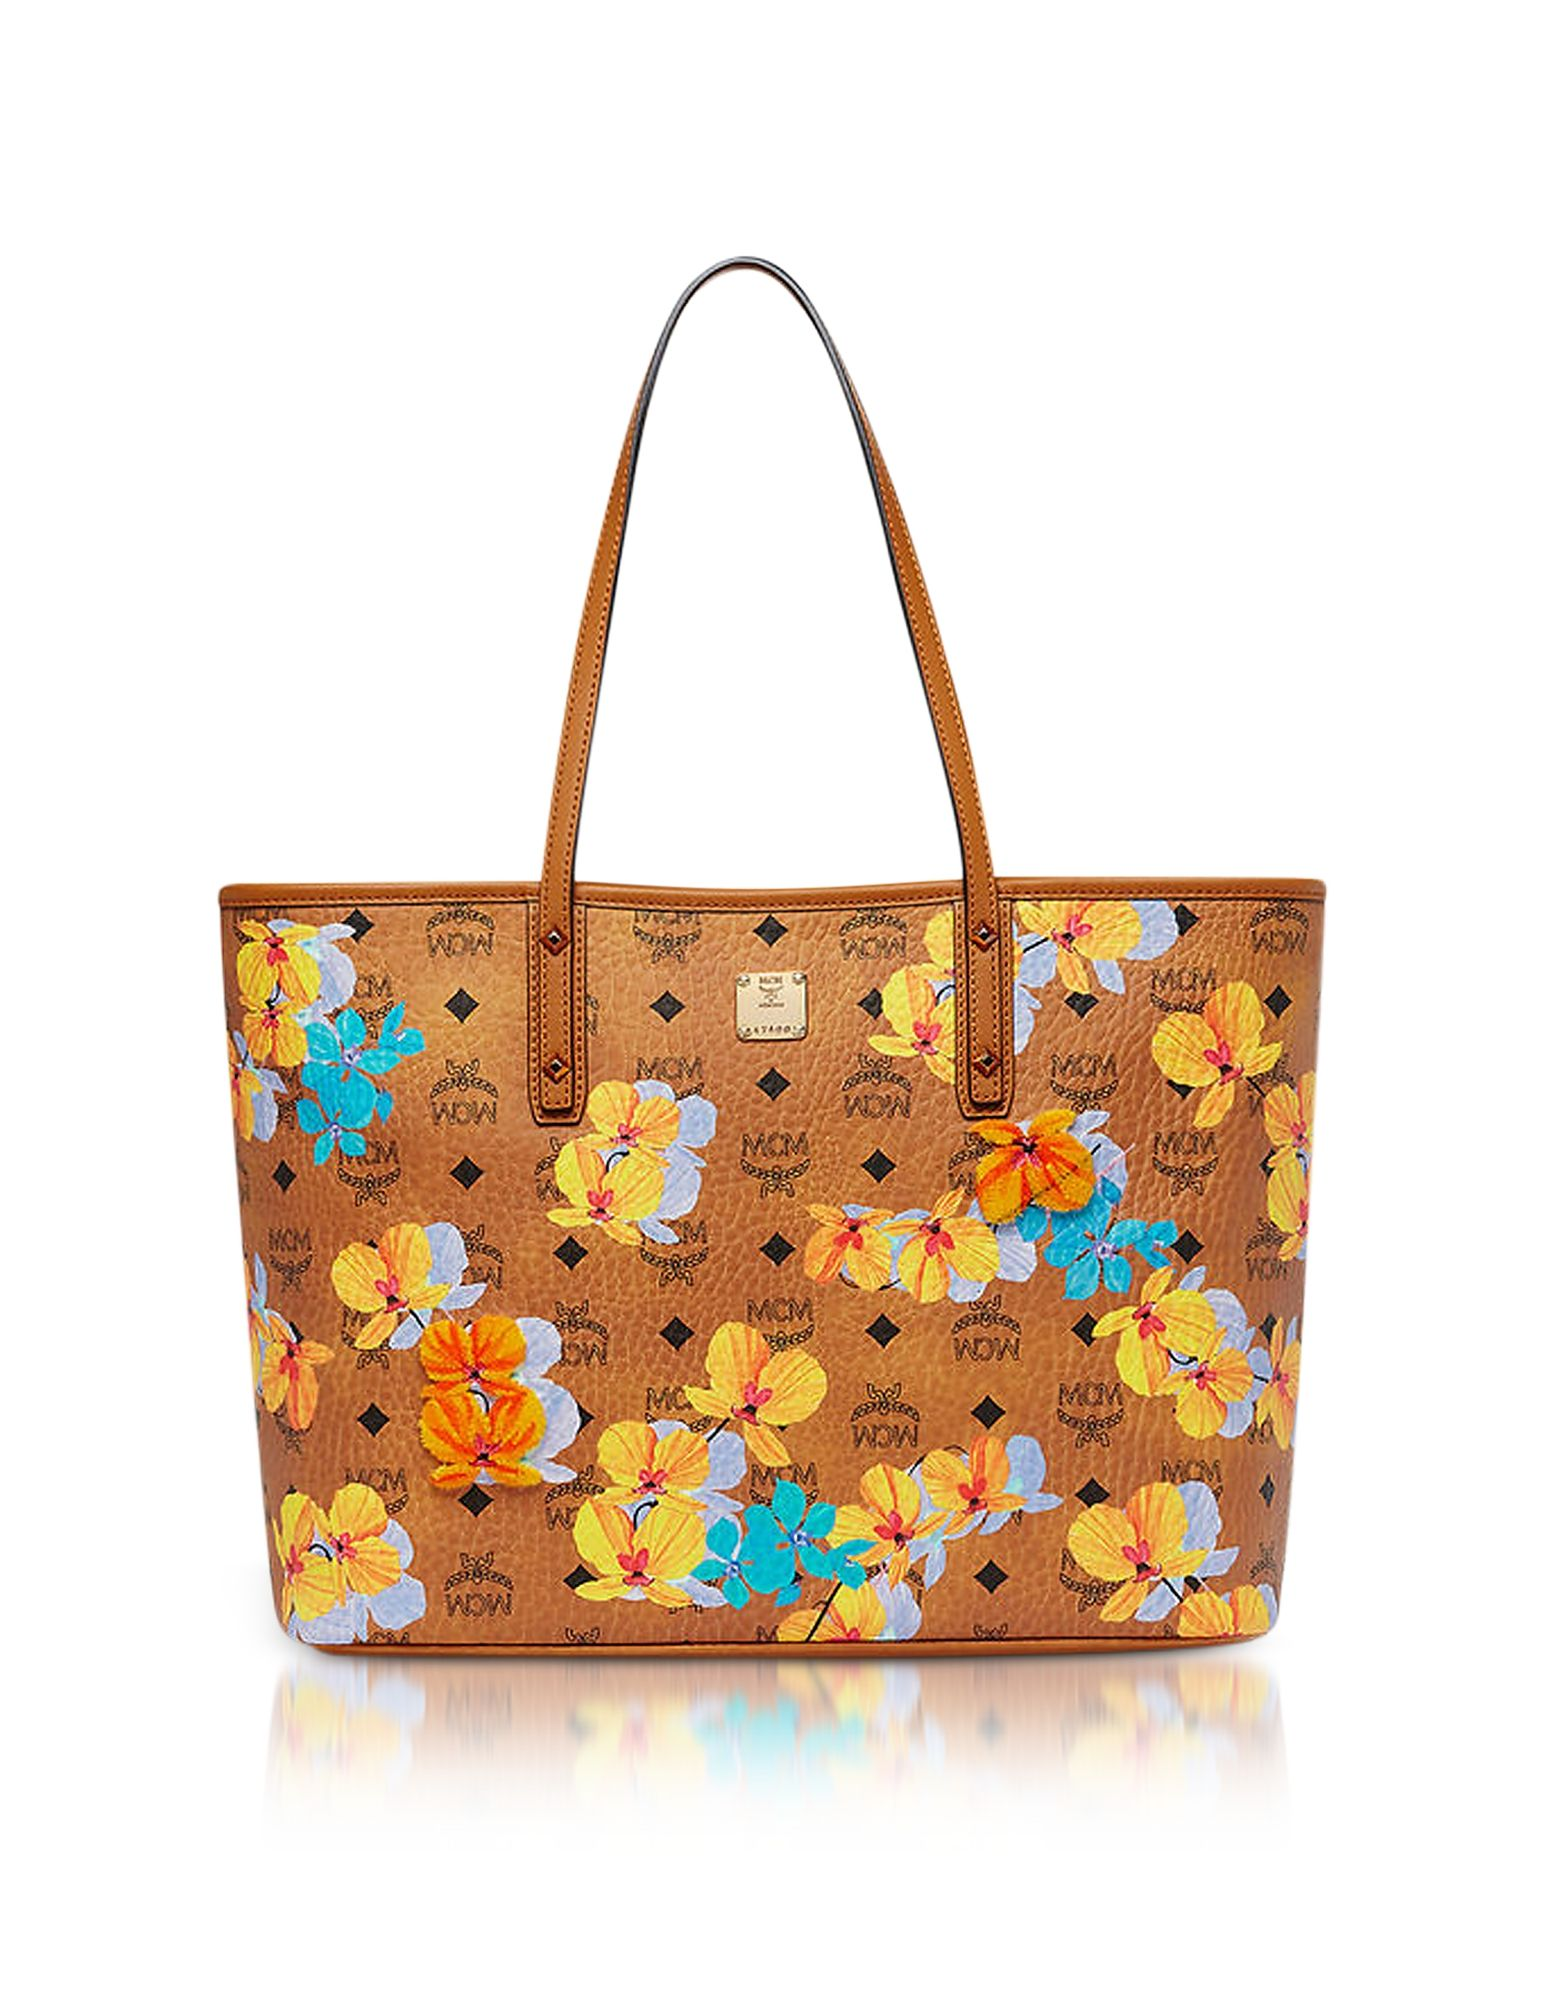 b2bad0e8bfa13c MCM . #mcm #bags #shoulder bags #hand bags #canvas #leather #tote ...